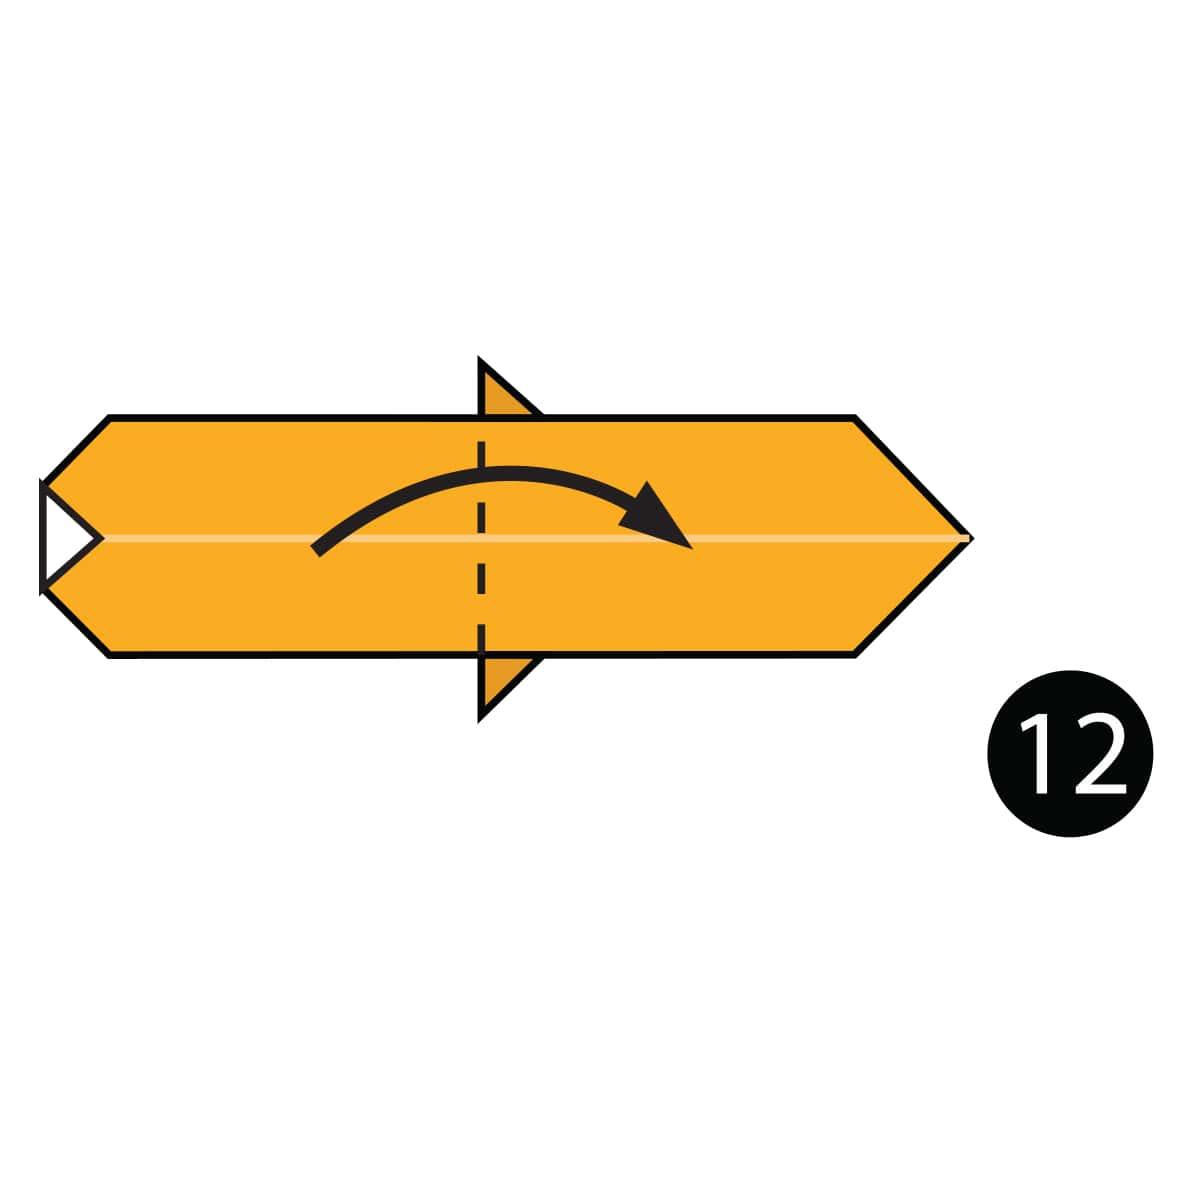 Dachshund Step 12